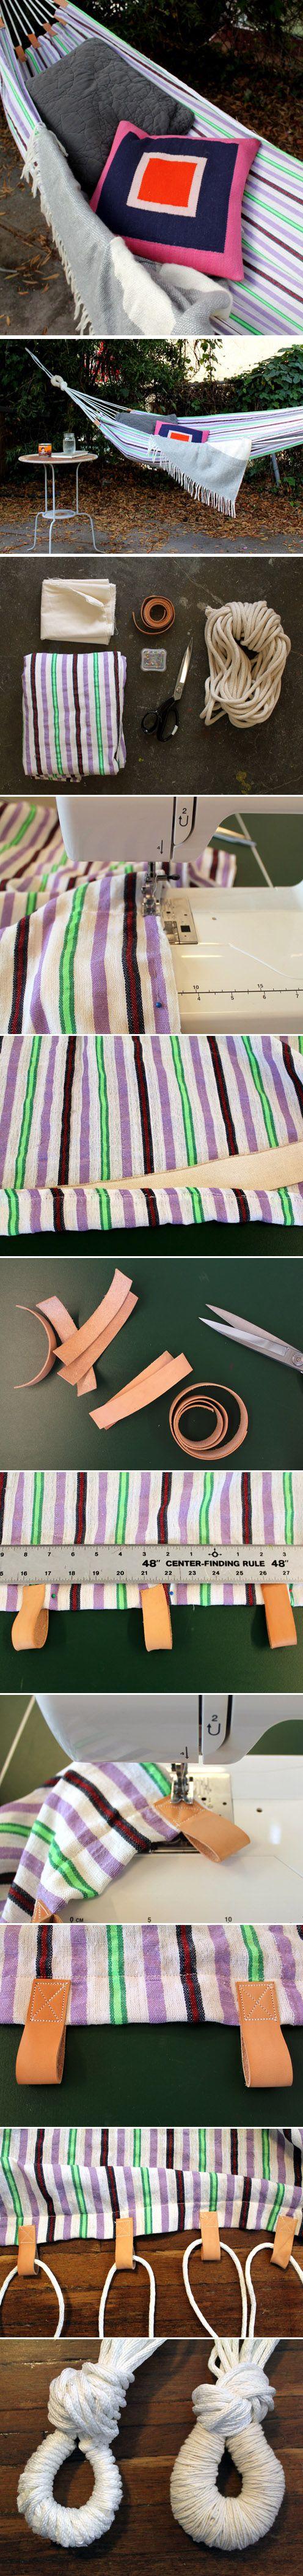 DIY: Make a hammock